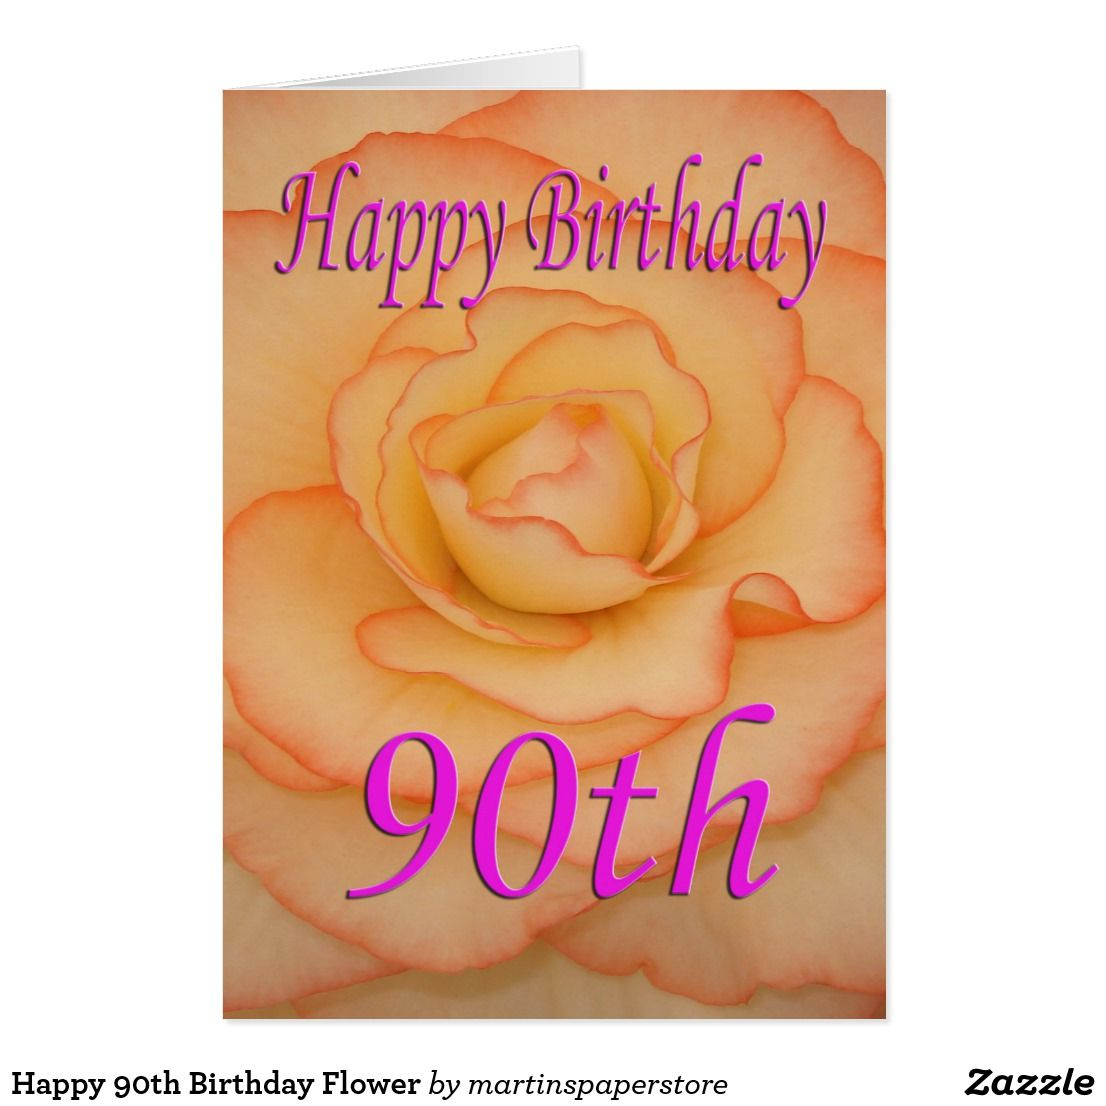 Happy 90th birthday flower card all things zazzle pinterest happy 90th birthday flower card izmirmasajfo